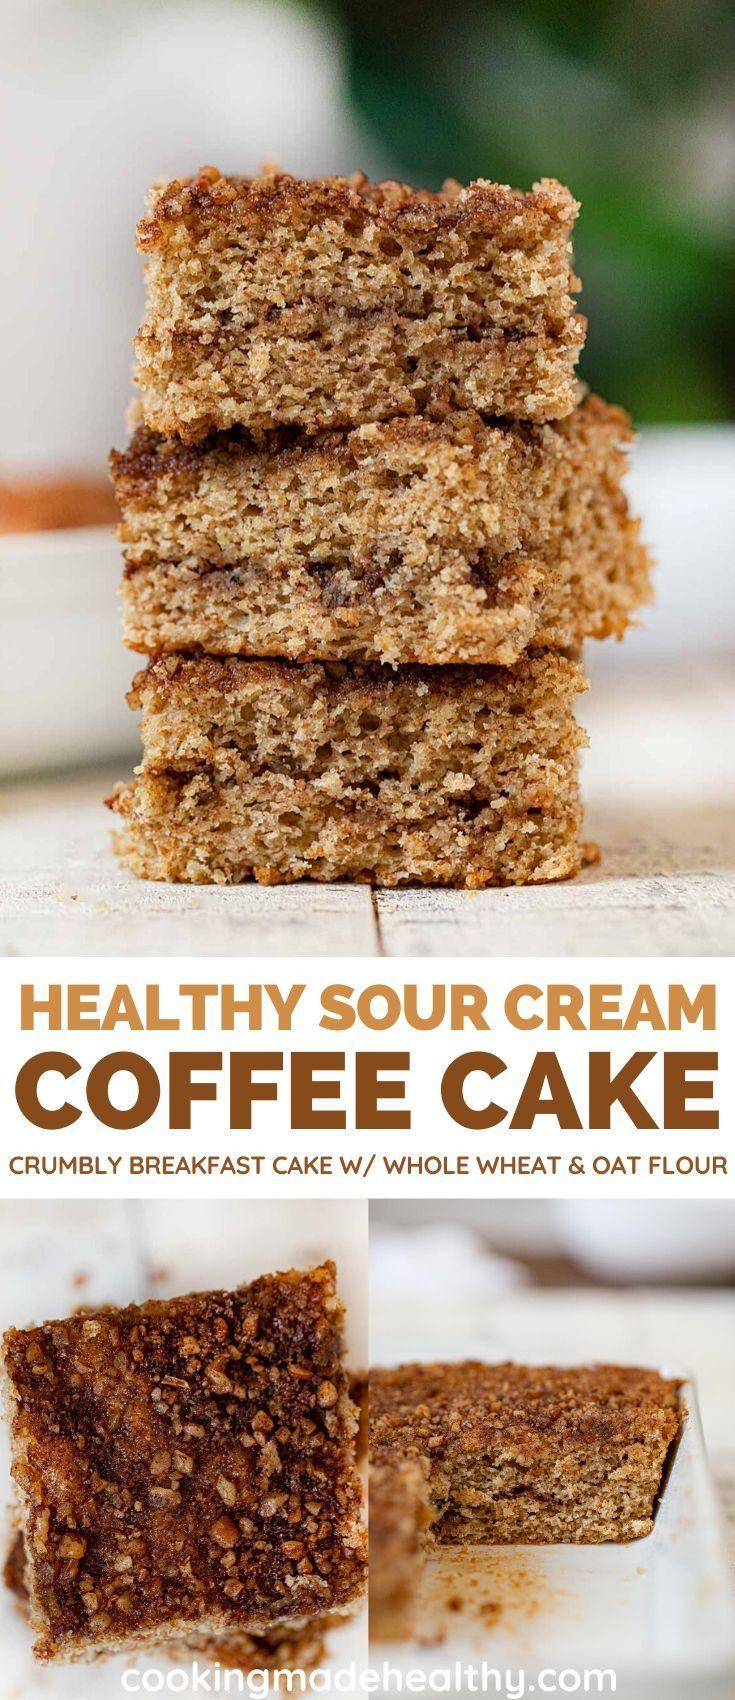 Healthy Sour Cream Coffee Cake Recipe Whole Wheat Cooking Made Healthy Recipe In 2020 Coffee Cake Healthy Sour Cream Sour Cream Coffee Cake